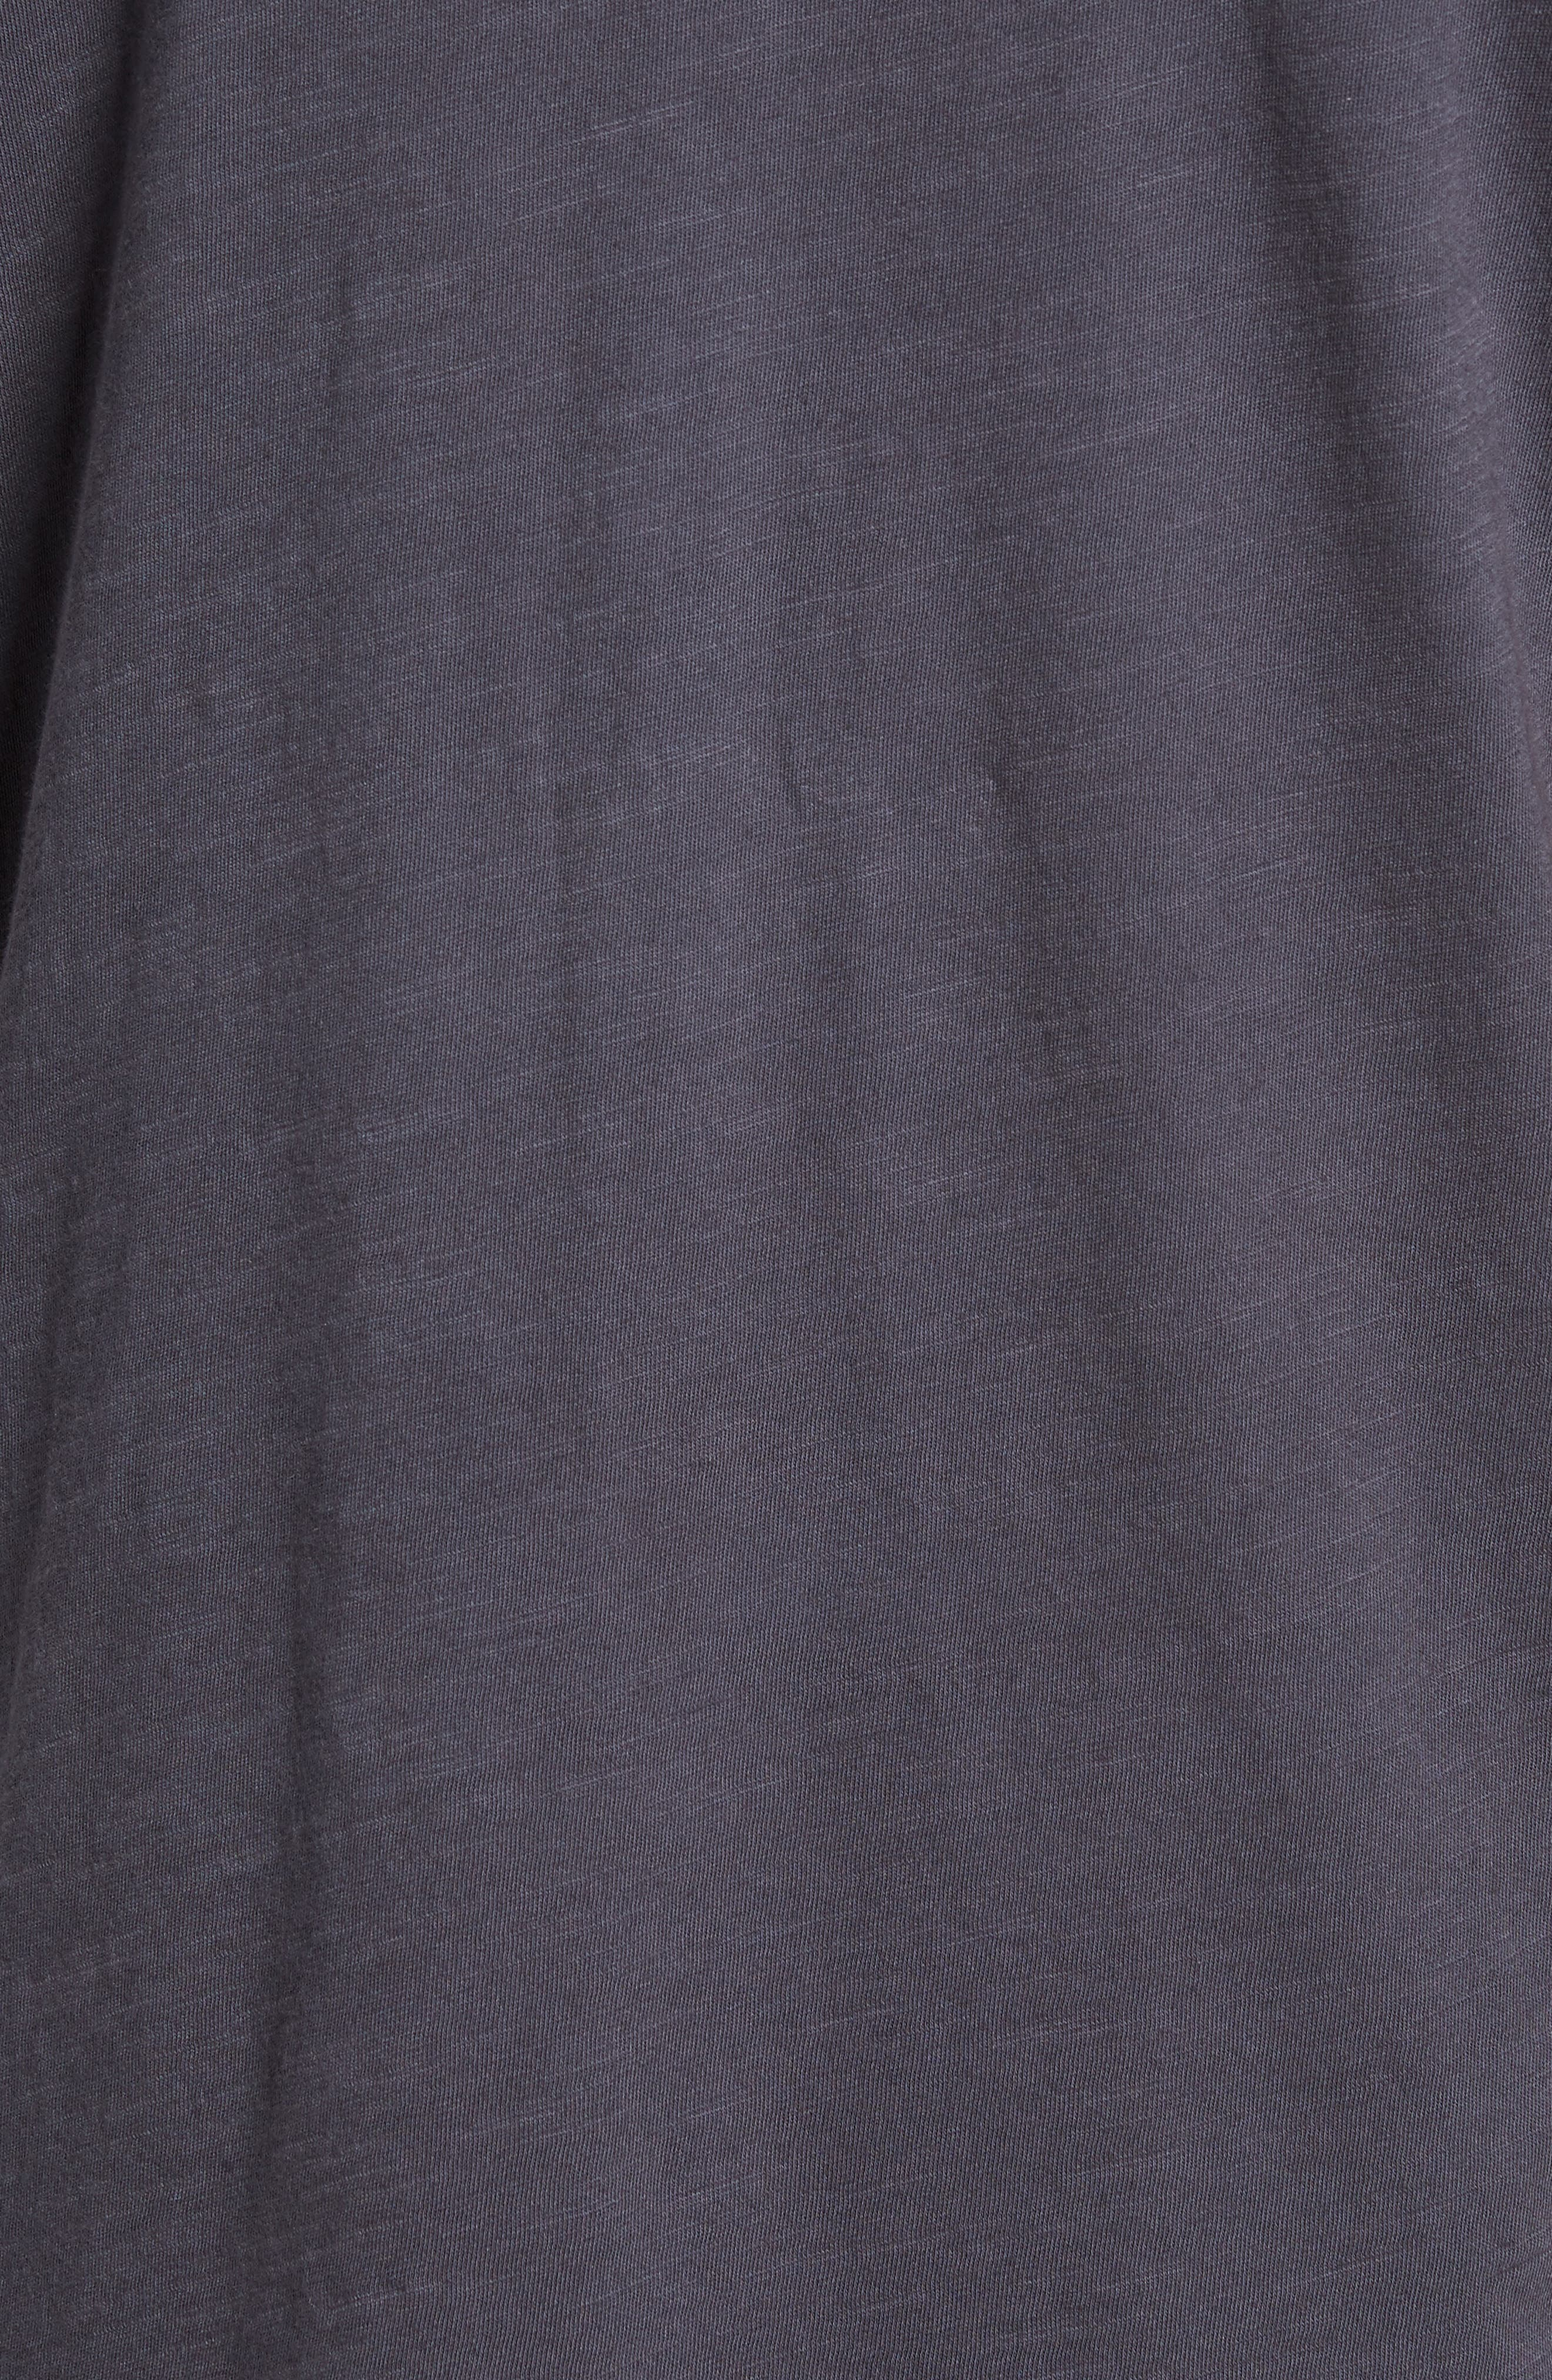 'Randall' Slub Knit Polo,                             Alternate thumbnail 5, color,                             093